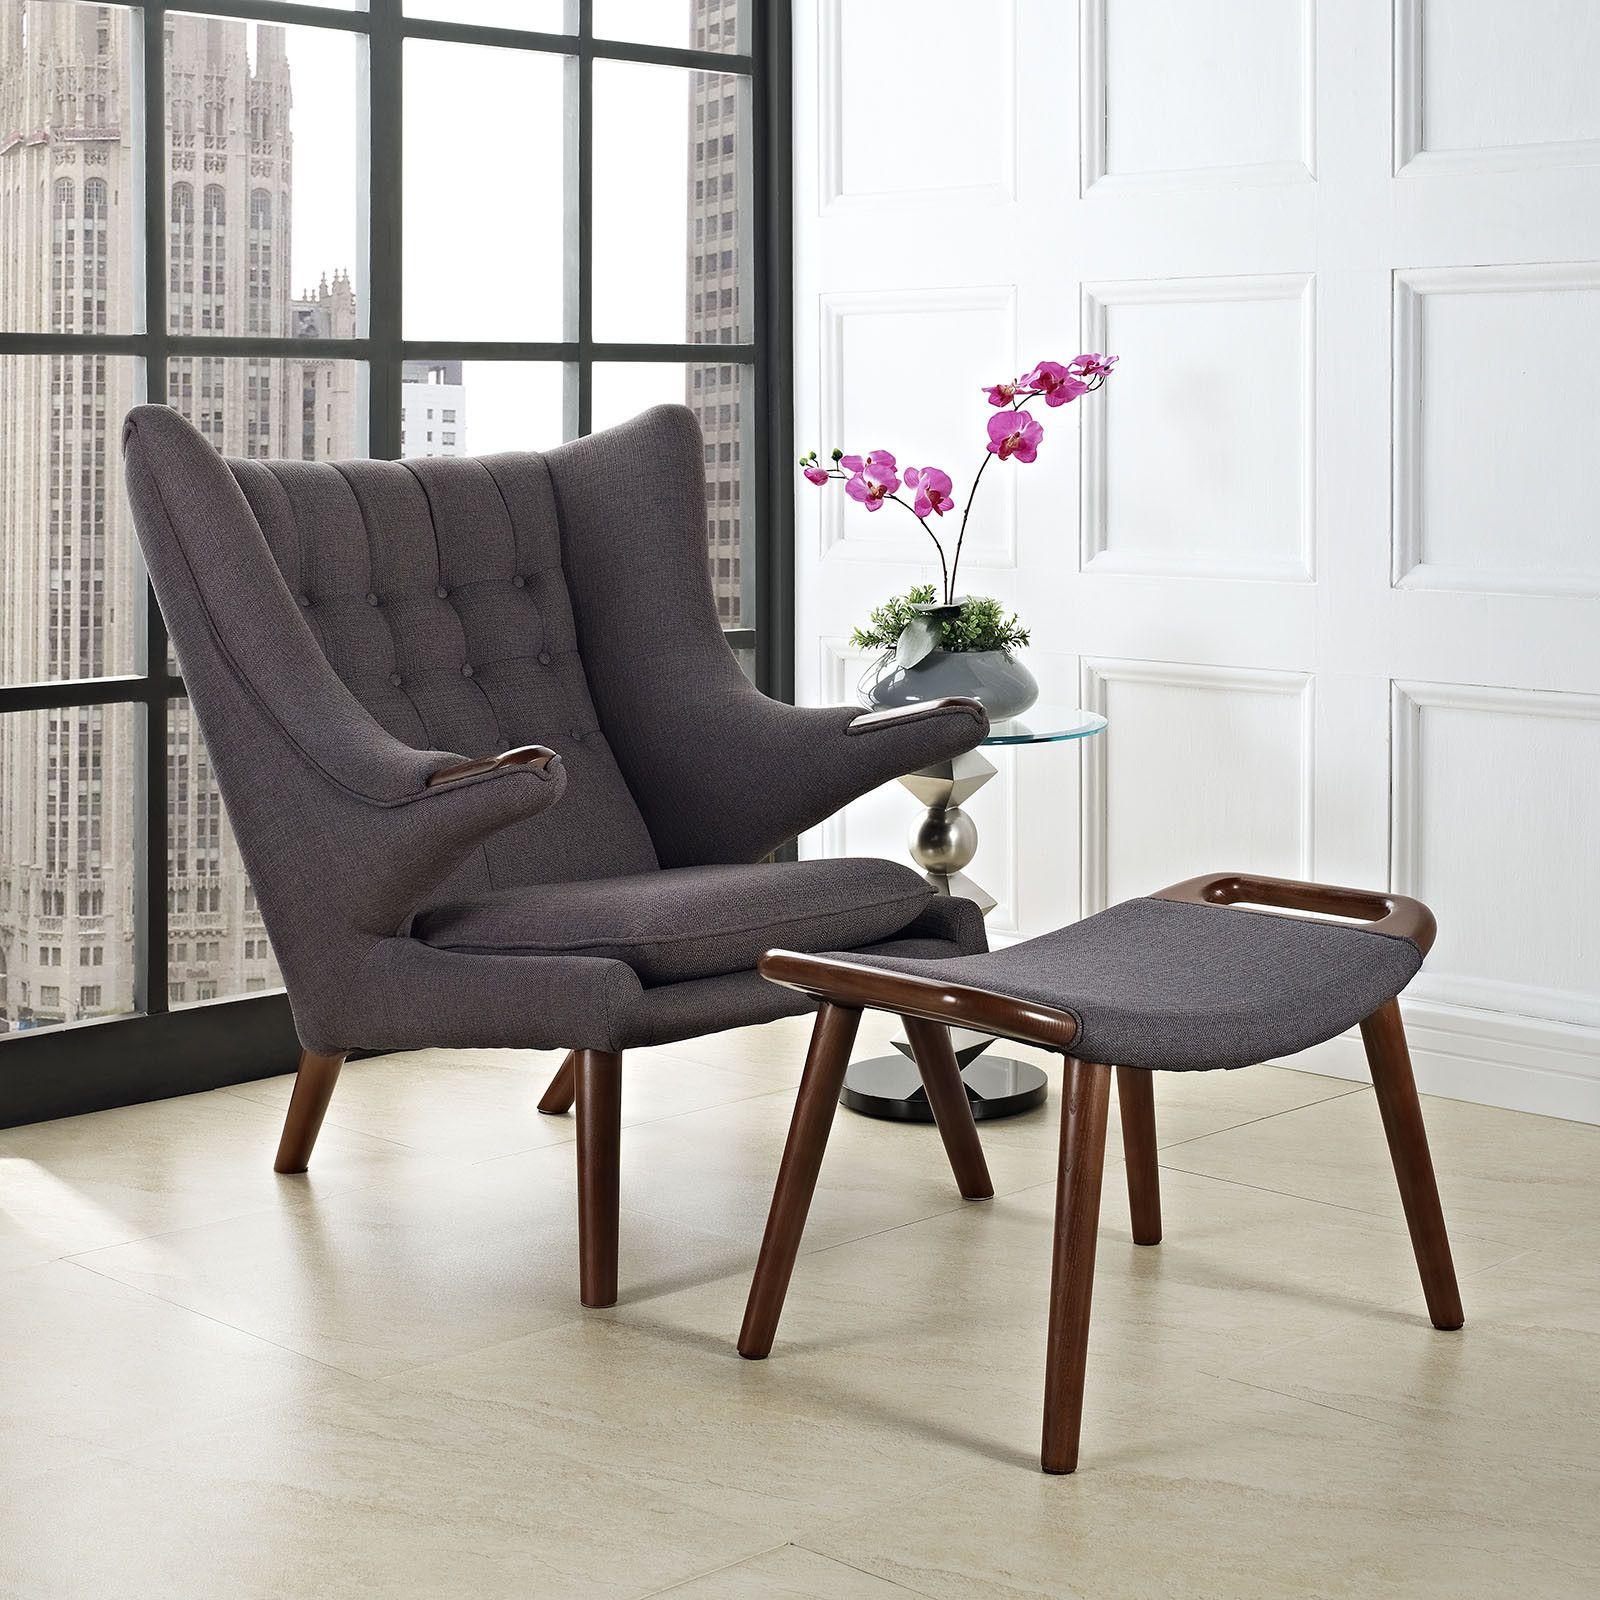 Bear Coffee Table Wegner Papa Bear Chair Ottoman Reproduction Chairs Ottomans